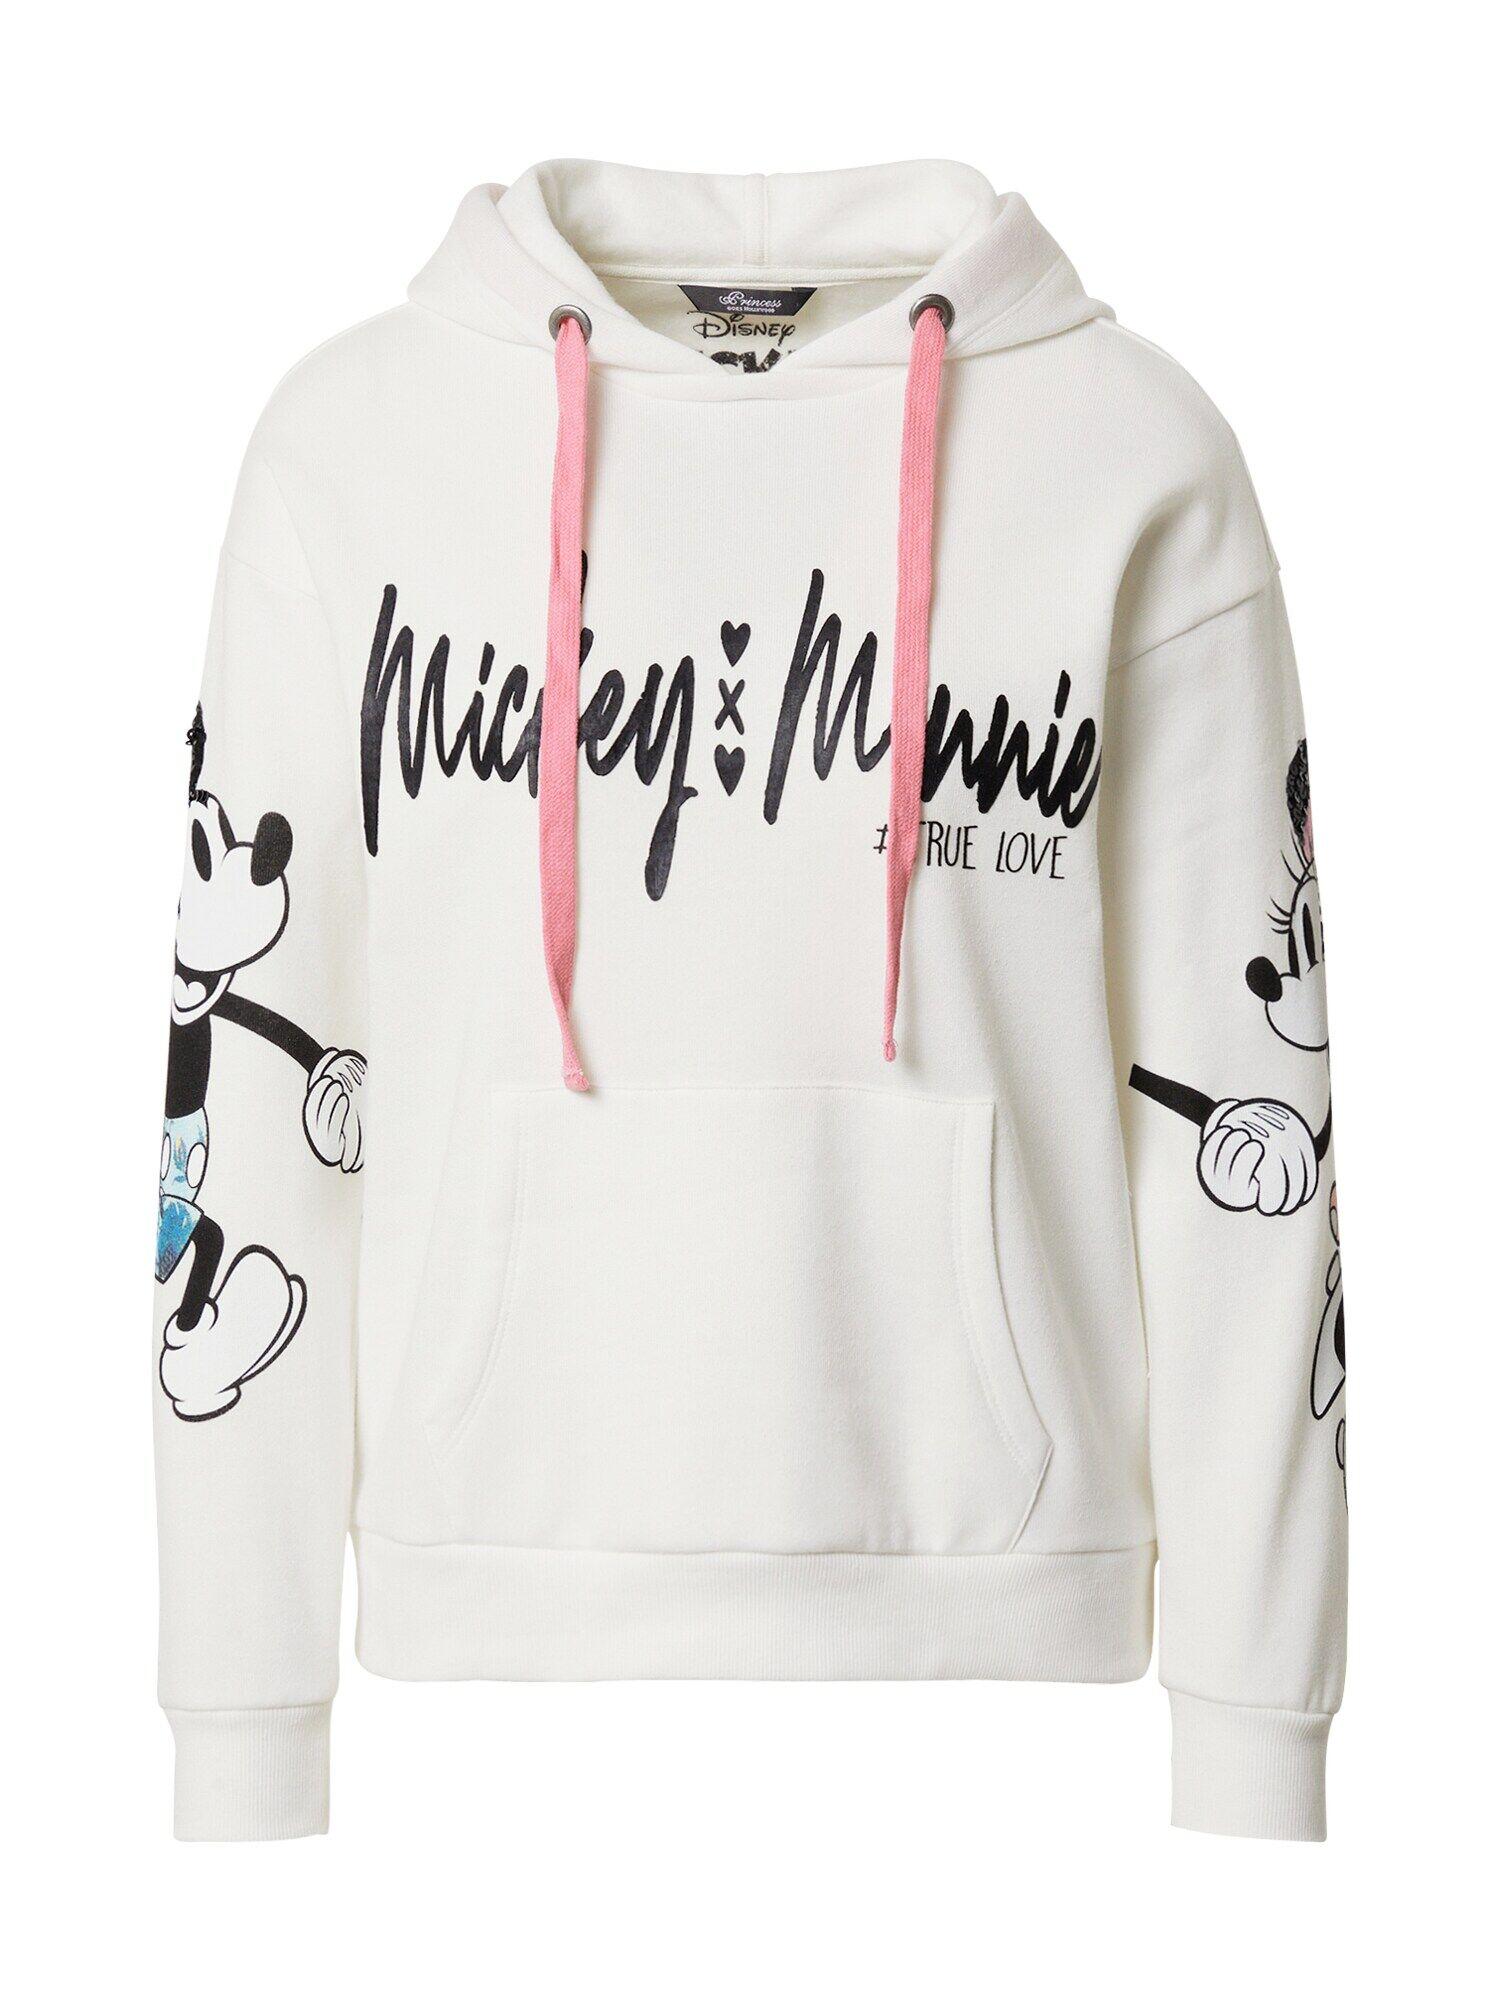 Princess Sweat-shirt 'Mickey & Minnie'  - Blanc - Taille: M - female